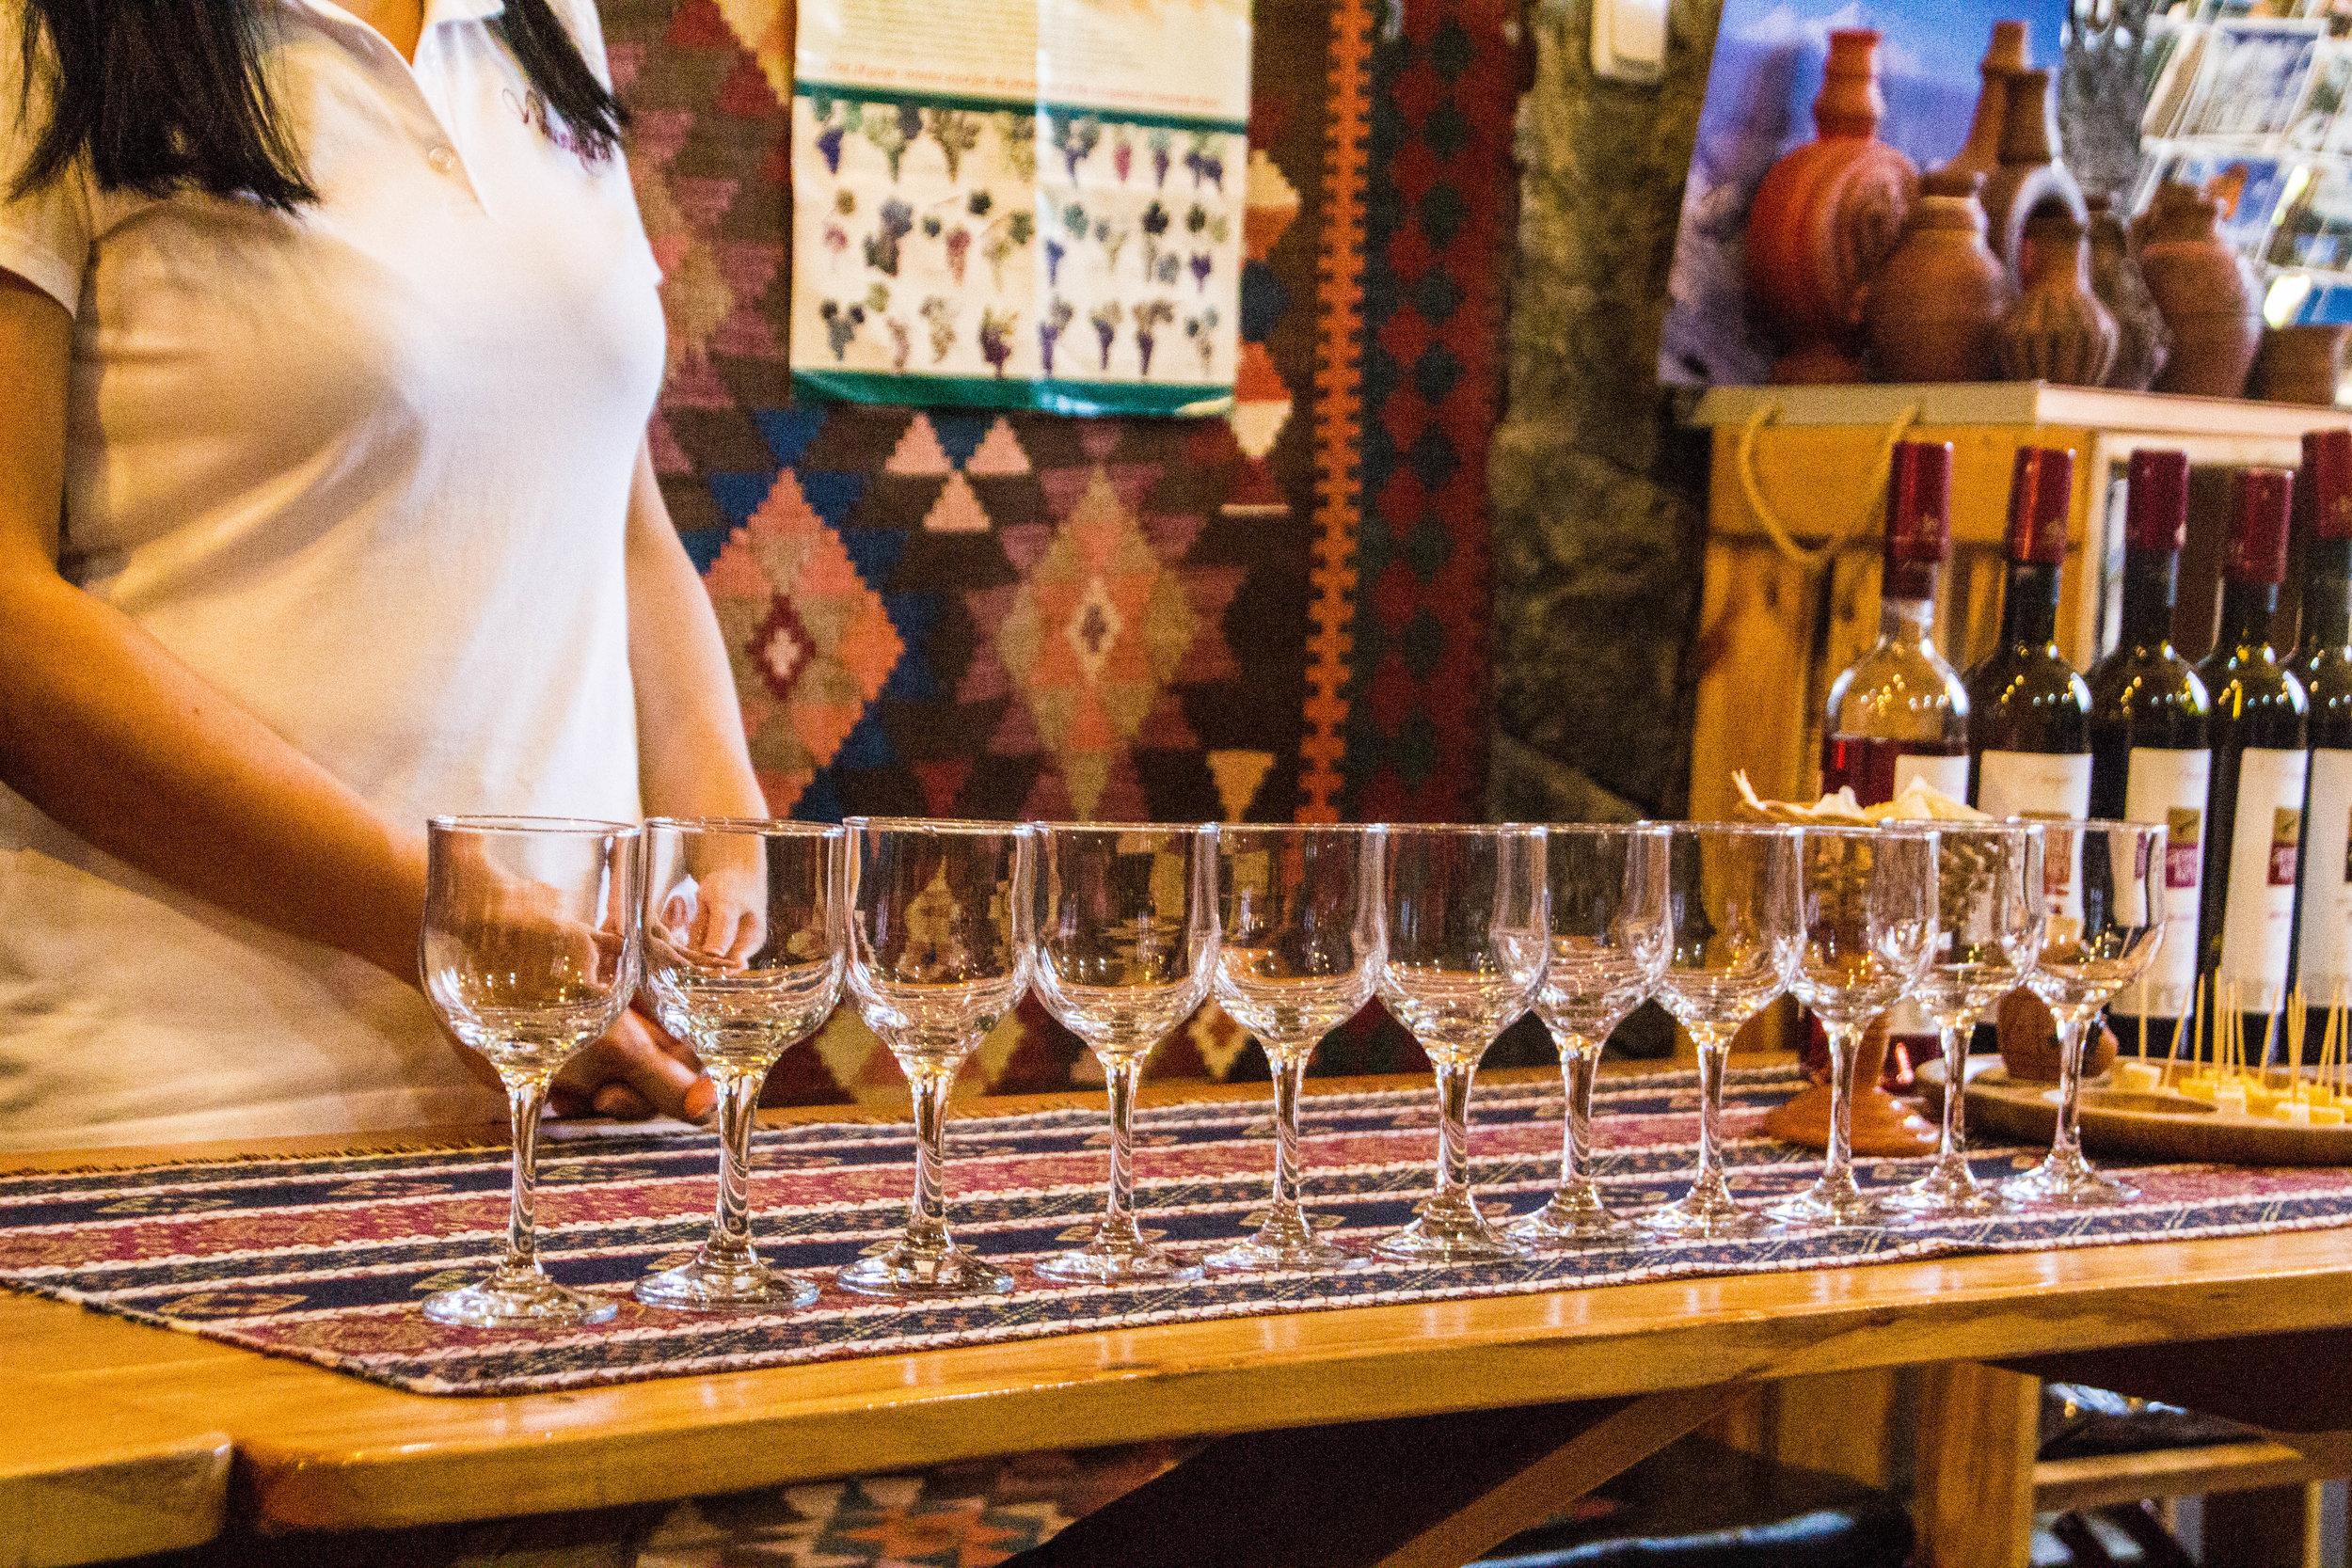 armenian-wine-tasting.jpg